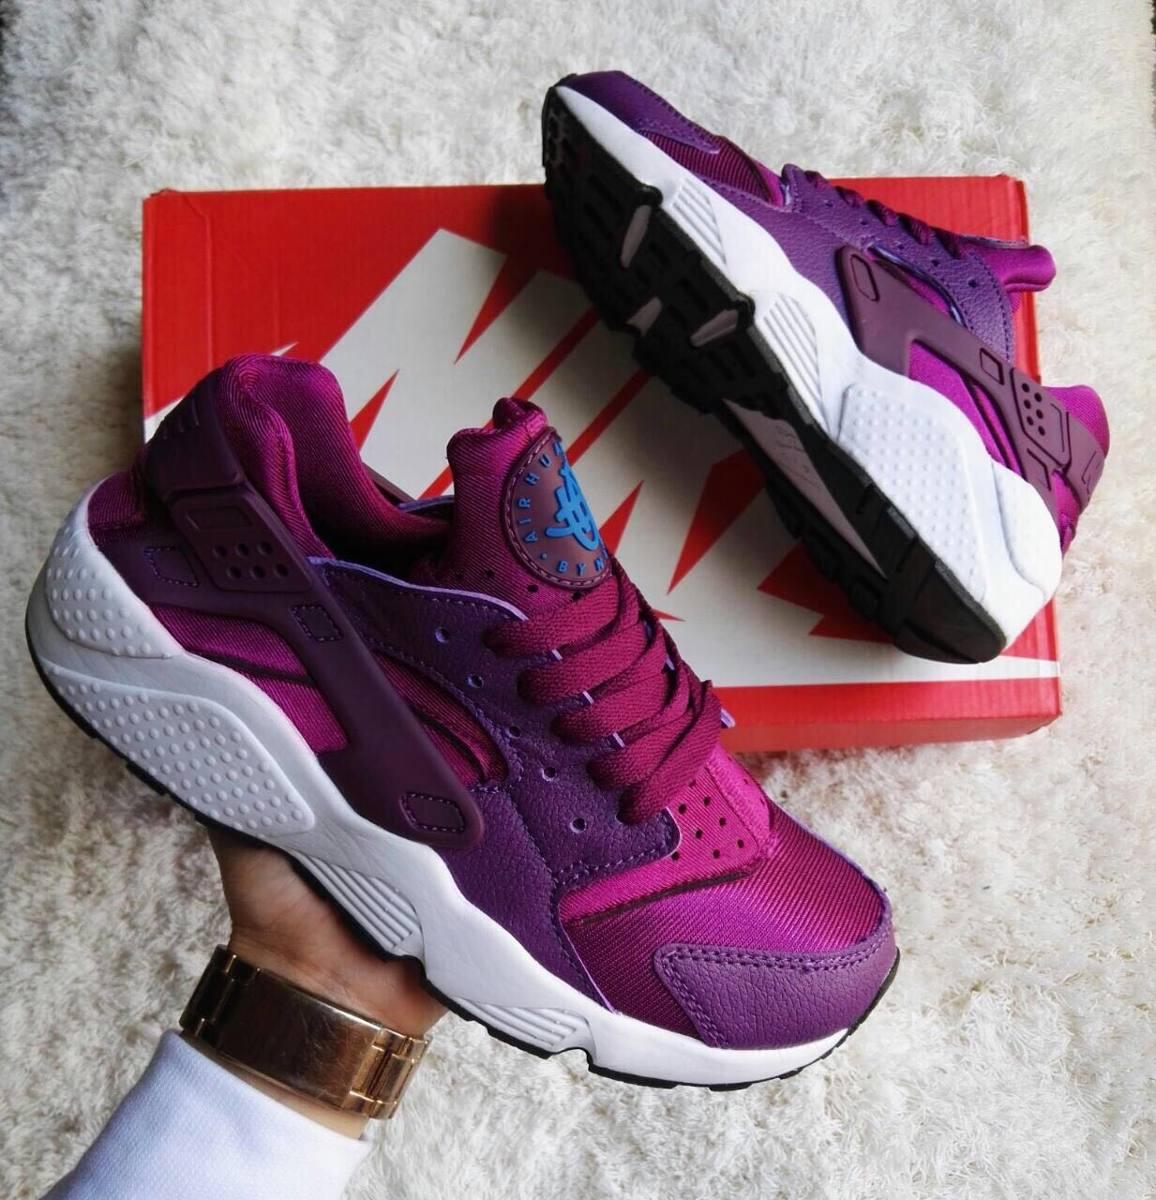 Nike Air Huarache morado